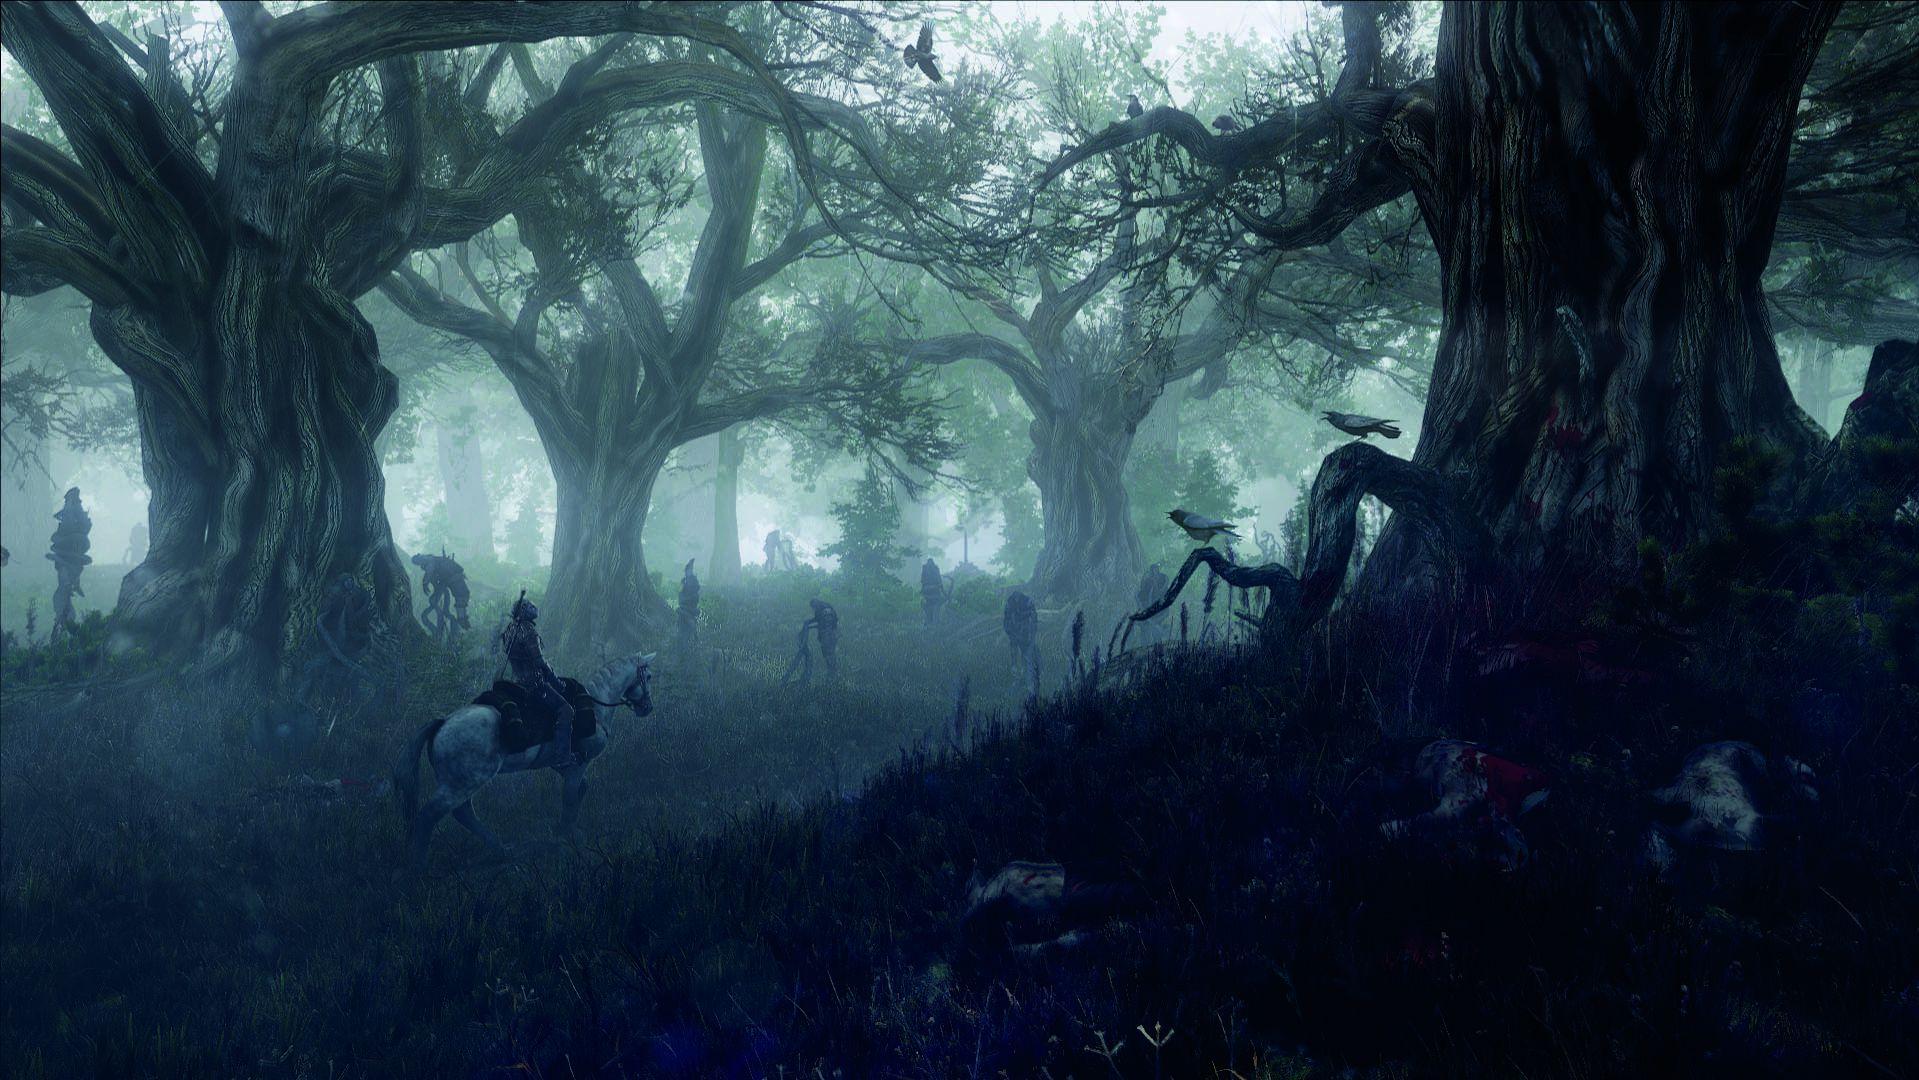 6263_the_witcher_3_wild_hunt_geralt_leshen_forest